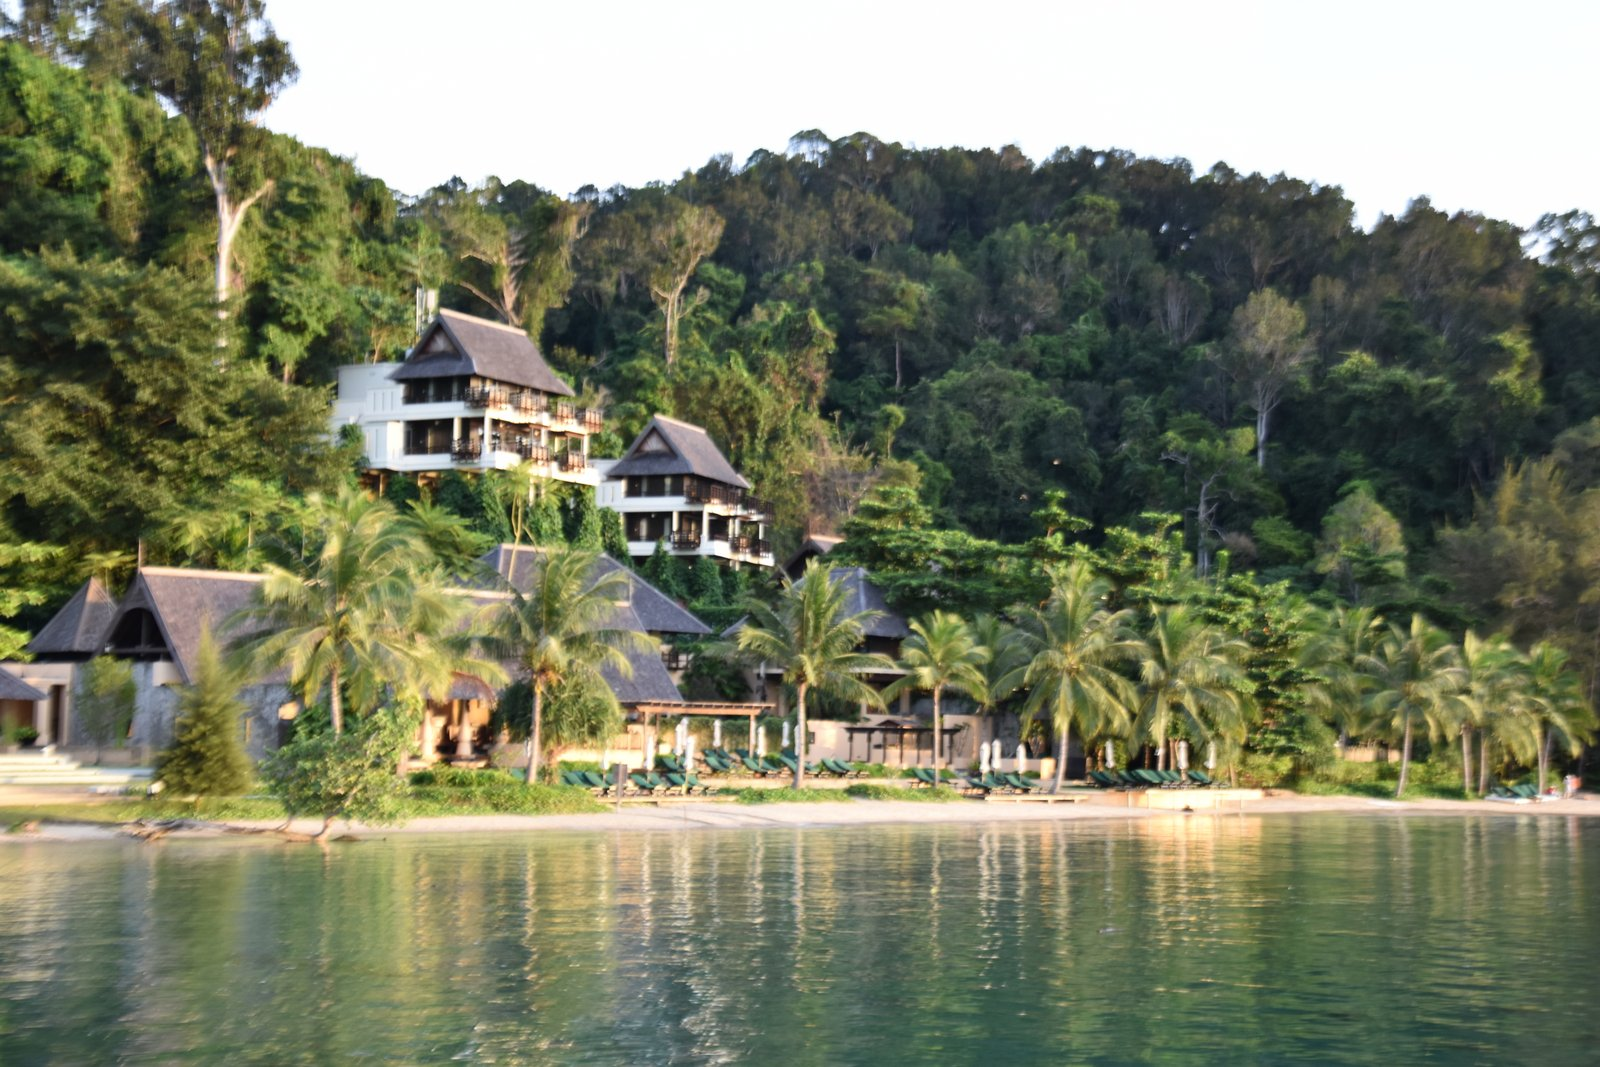 Gaya island resort sur l'île de Gaya en face de Kota Kinabalu